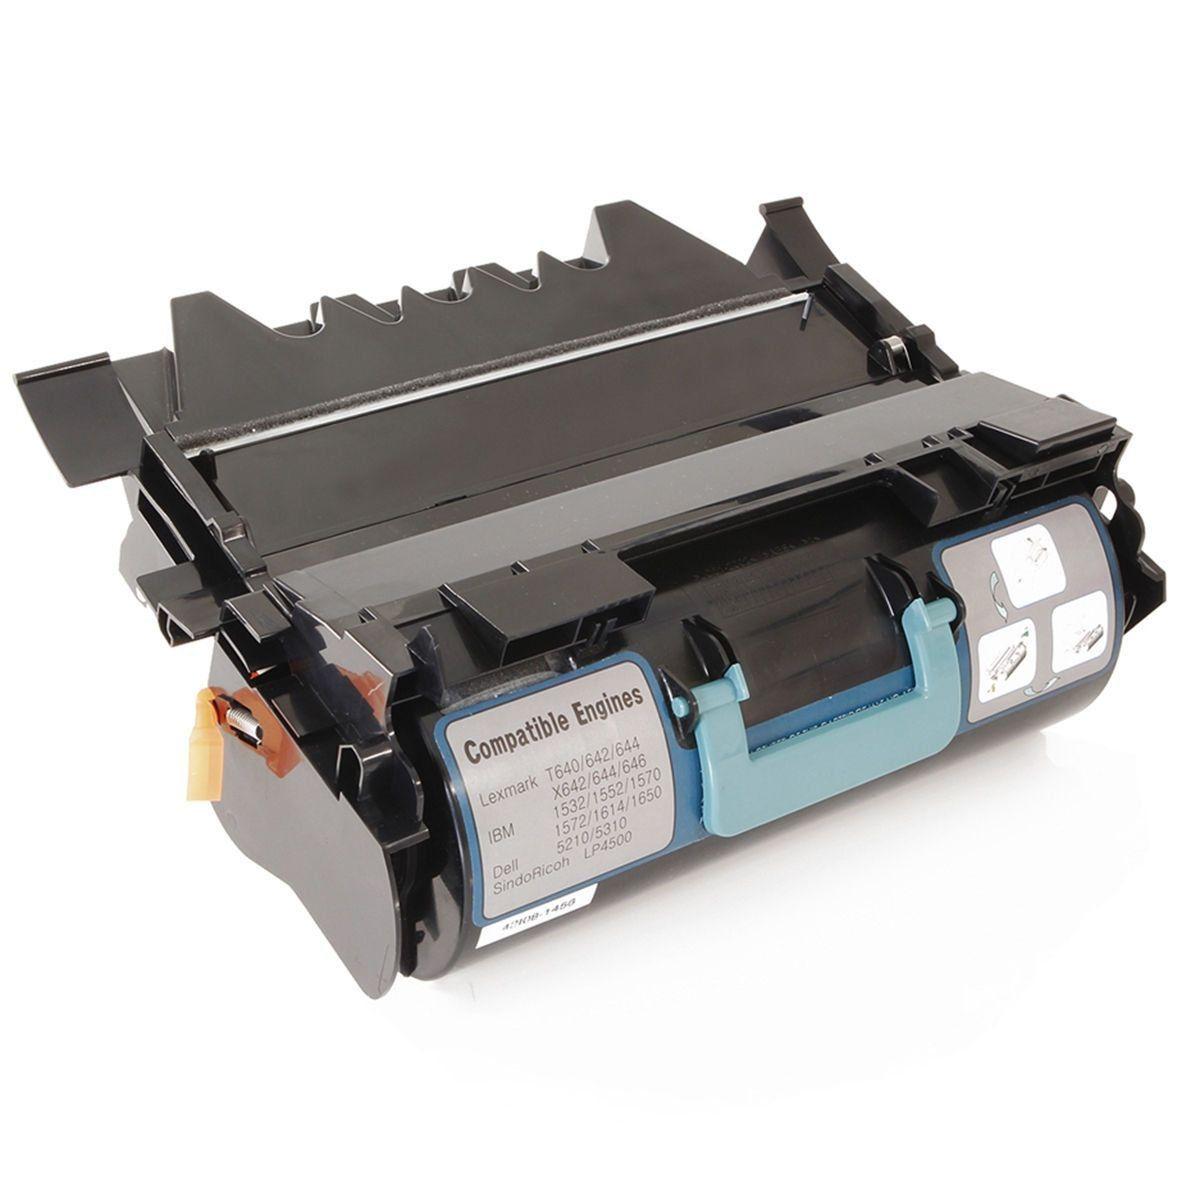 Compatível: Toner T640 para Lexmark T640n T642 T644 T646 T640dtn T642dtn T644dtn X640 X642 X644 X646 / Preto / 21.000